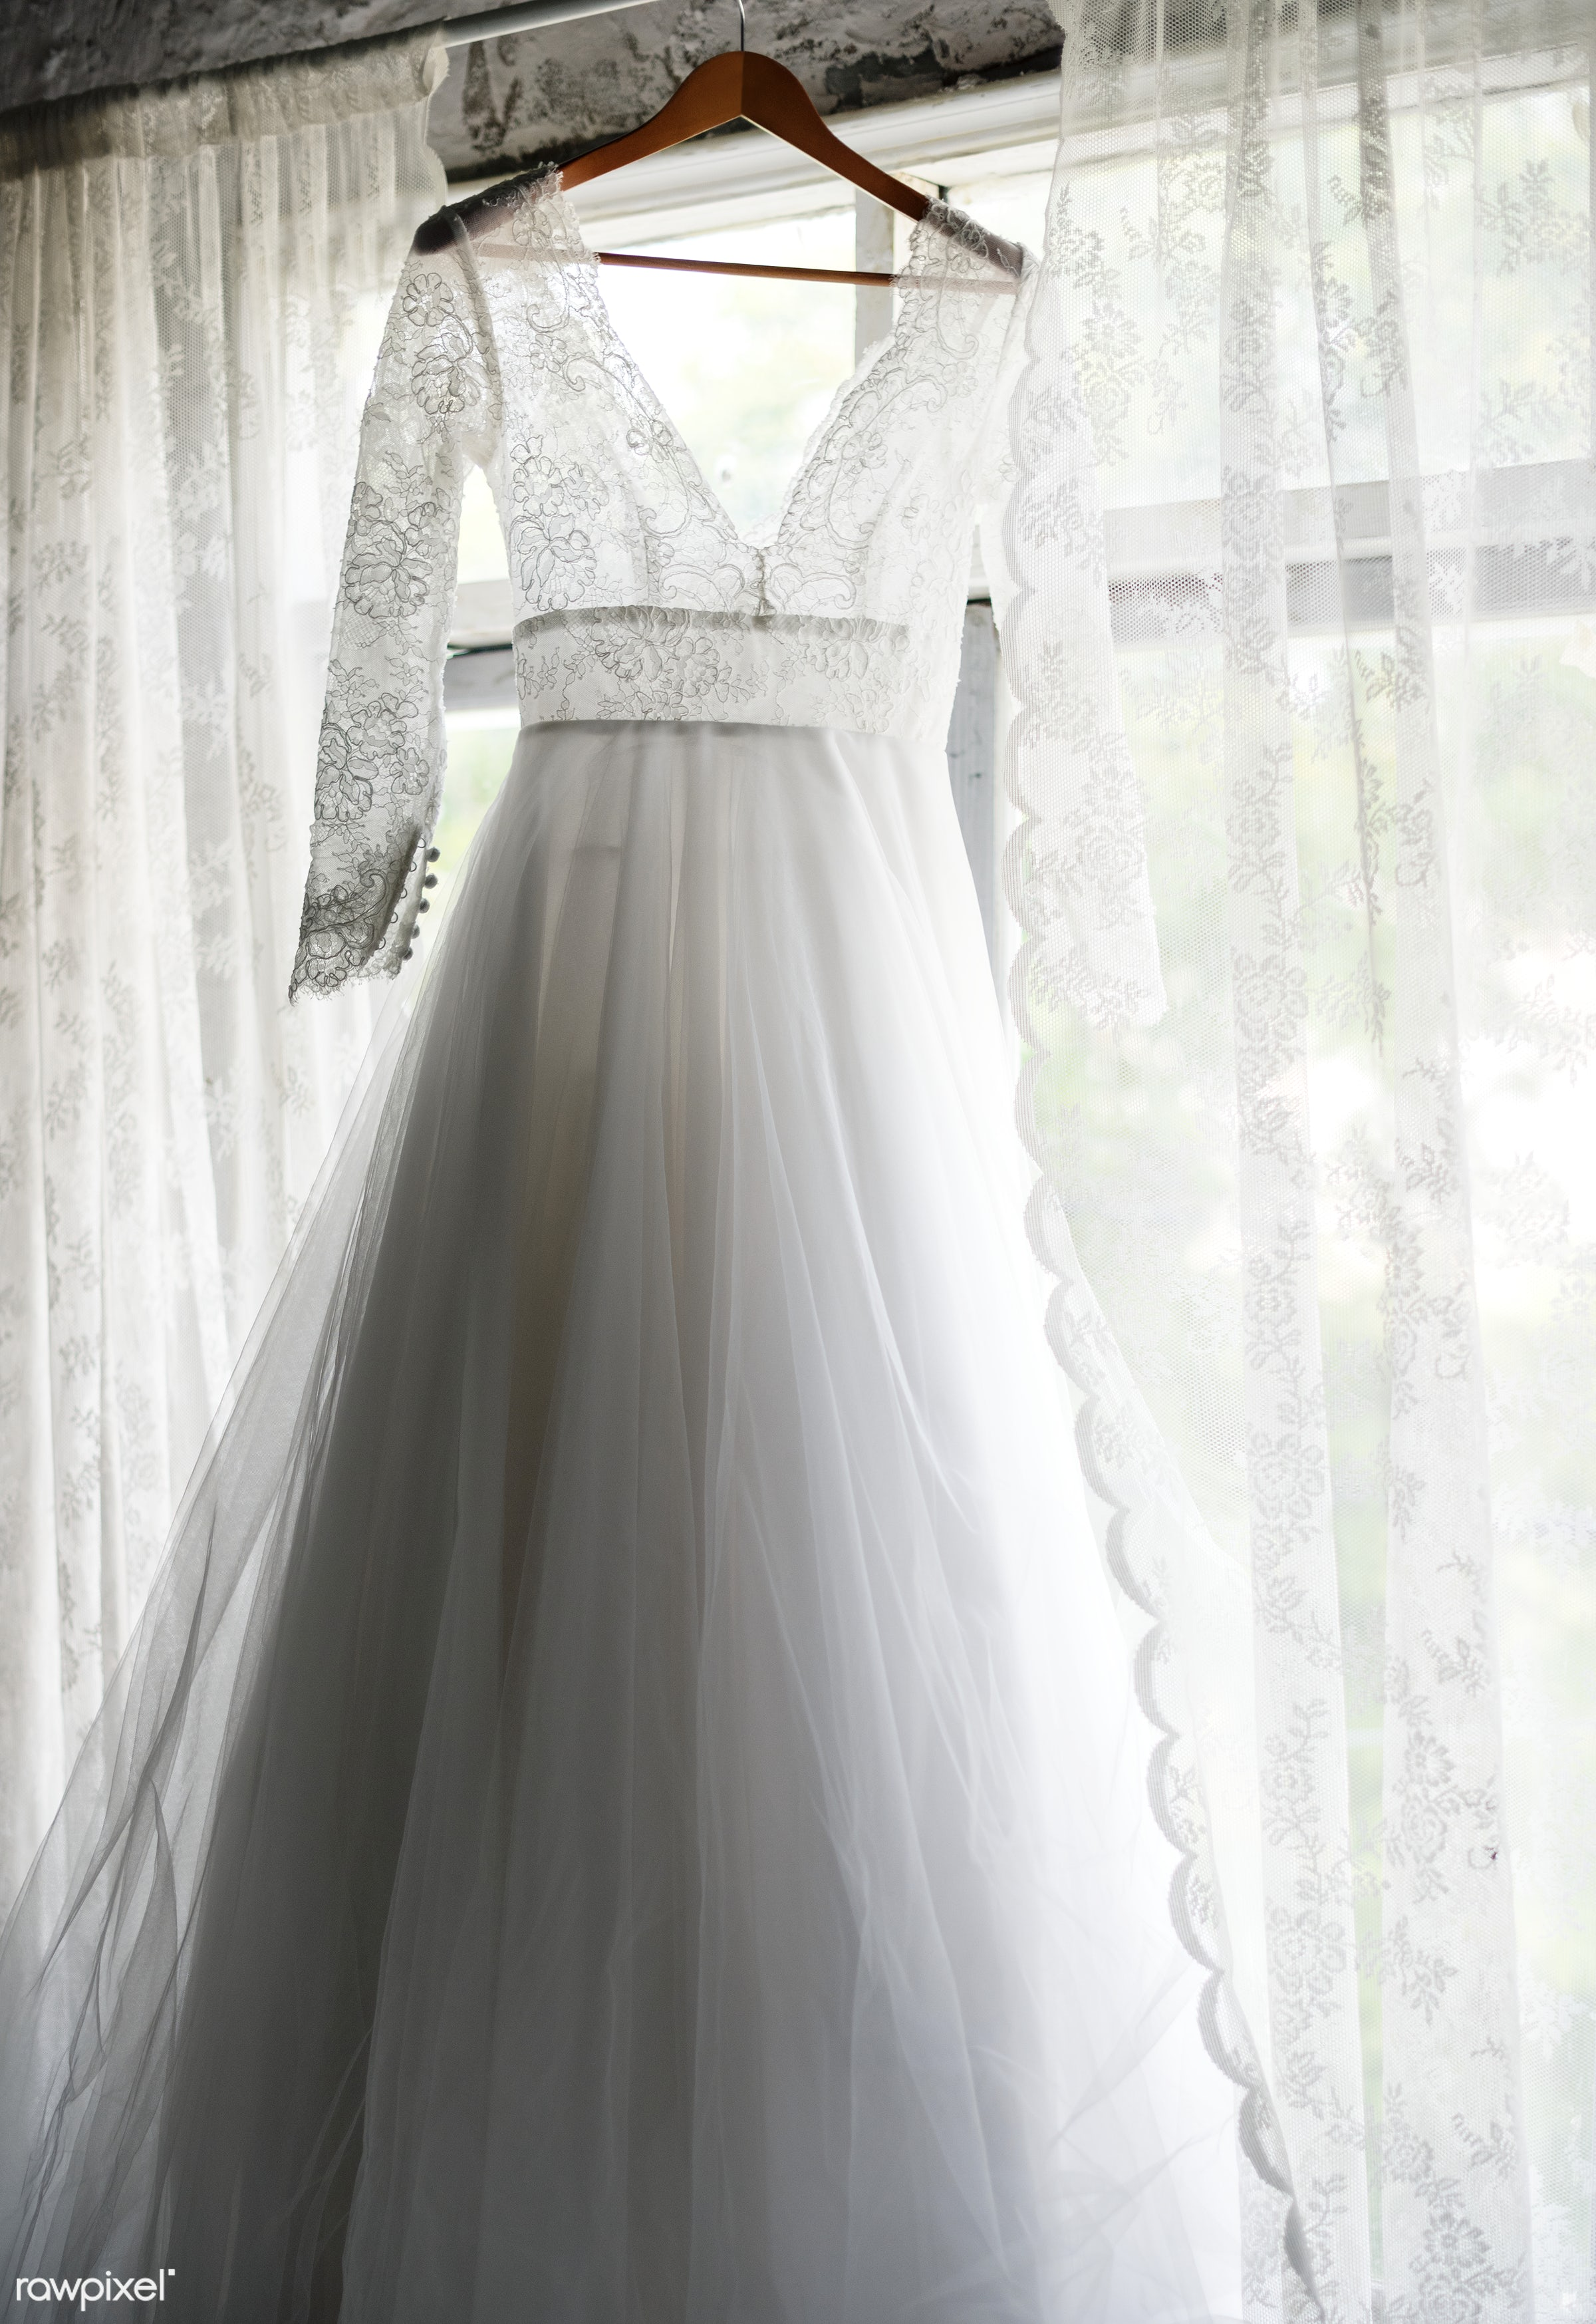 wedding, bridal, hanger, beautiful, bride, ceremony, dress, elegance, engagement, feminine, glamour, gown, hanging, lace,...